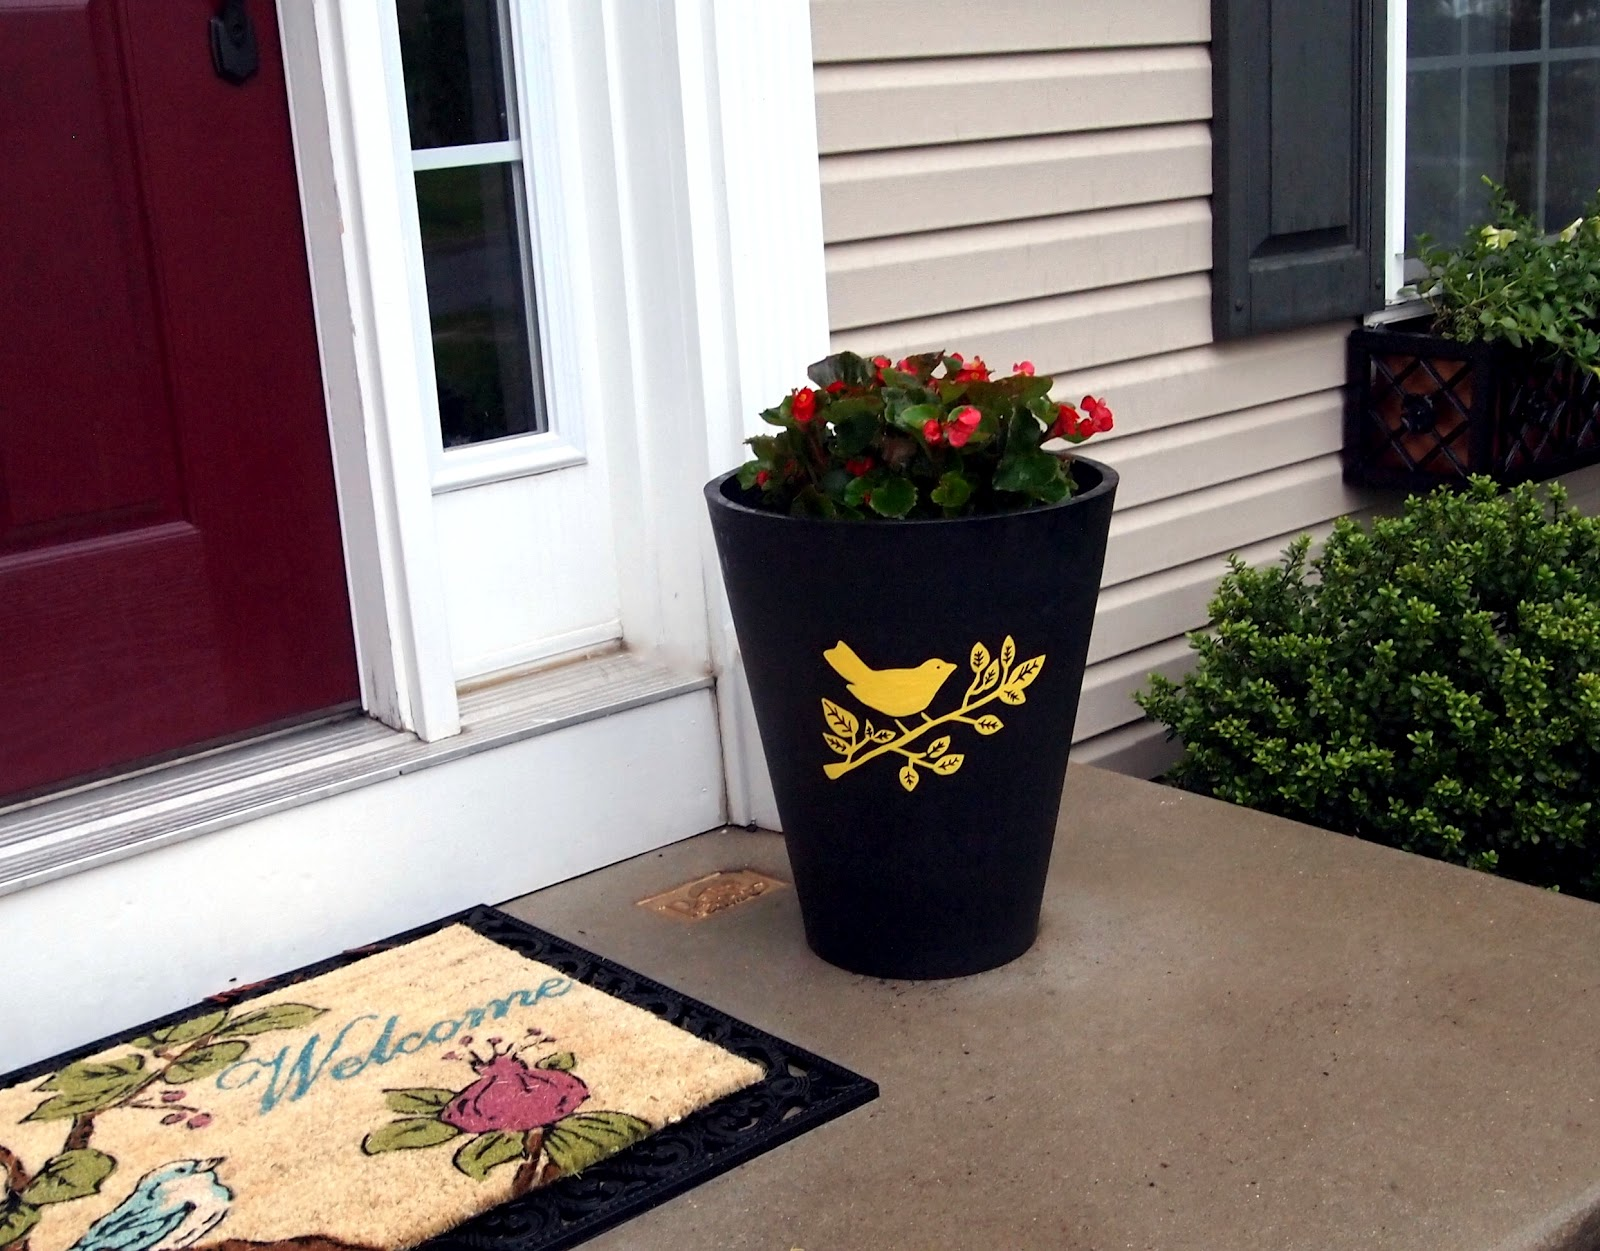 Loveyourroom diy stencil an outdoor planter diy stencil an outdoor planter workwithnaturefo